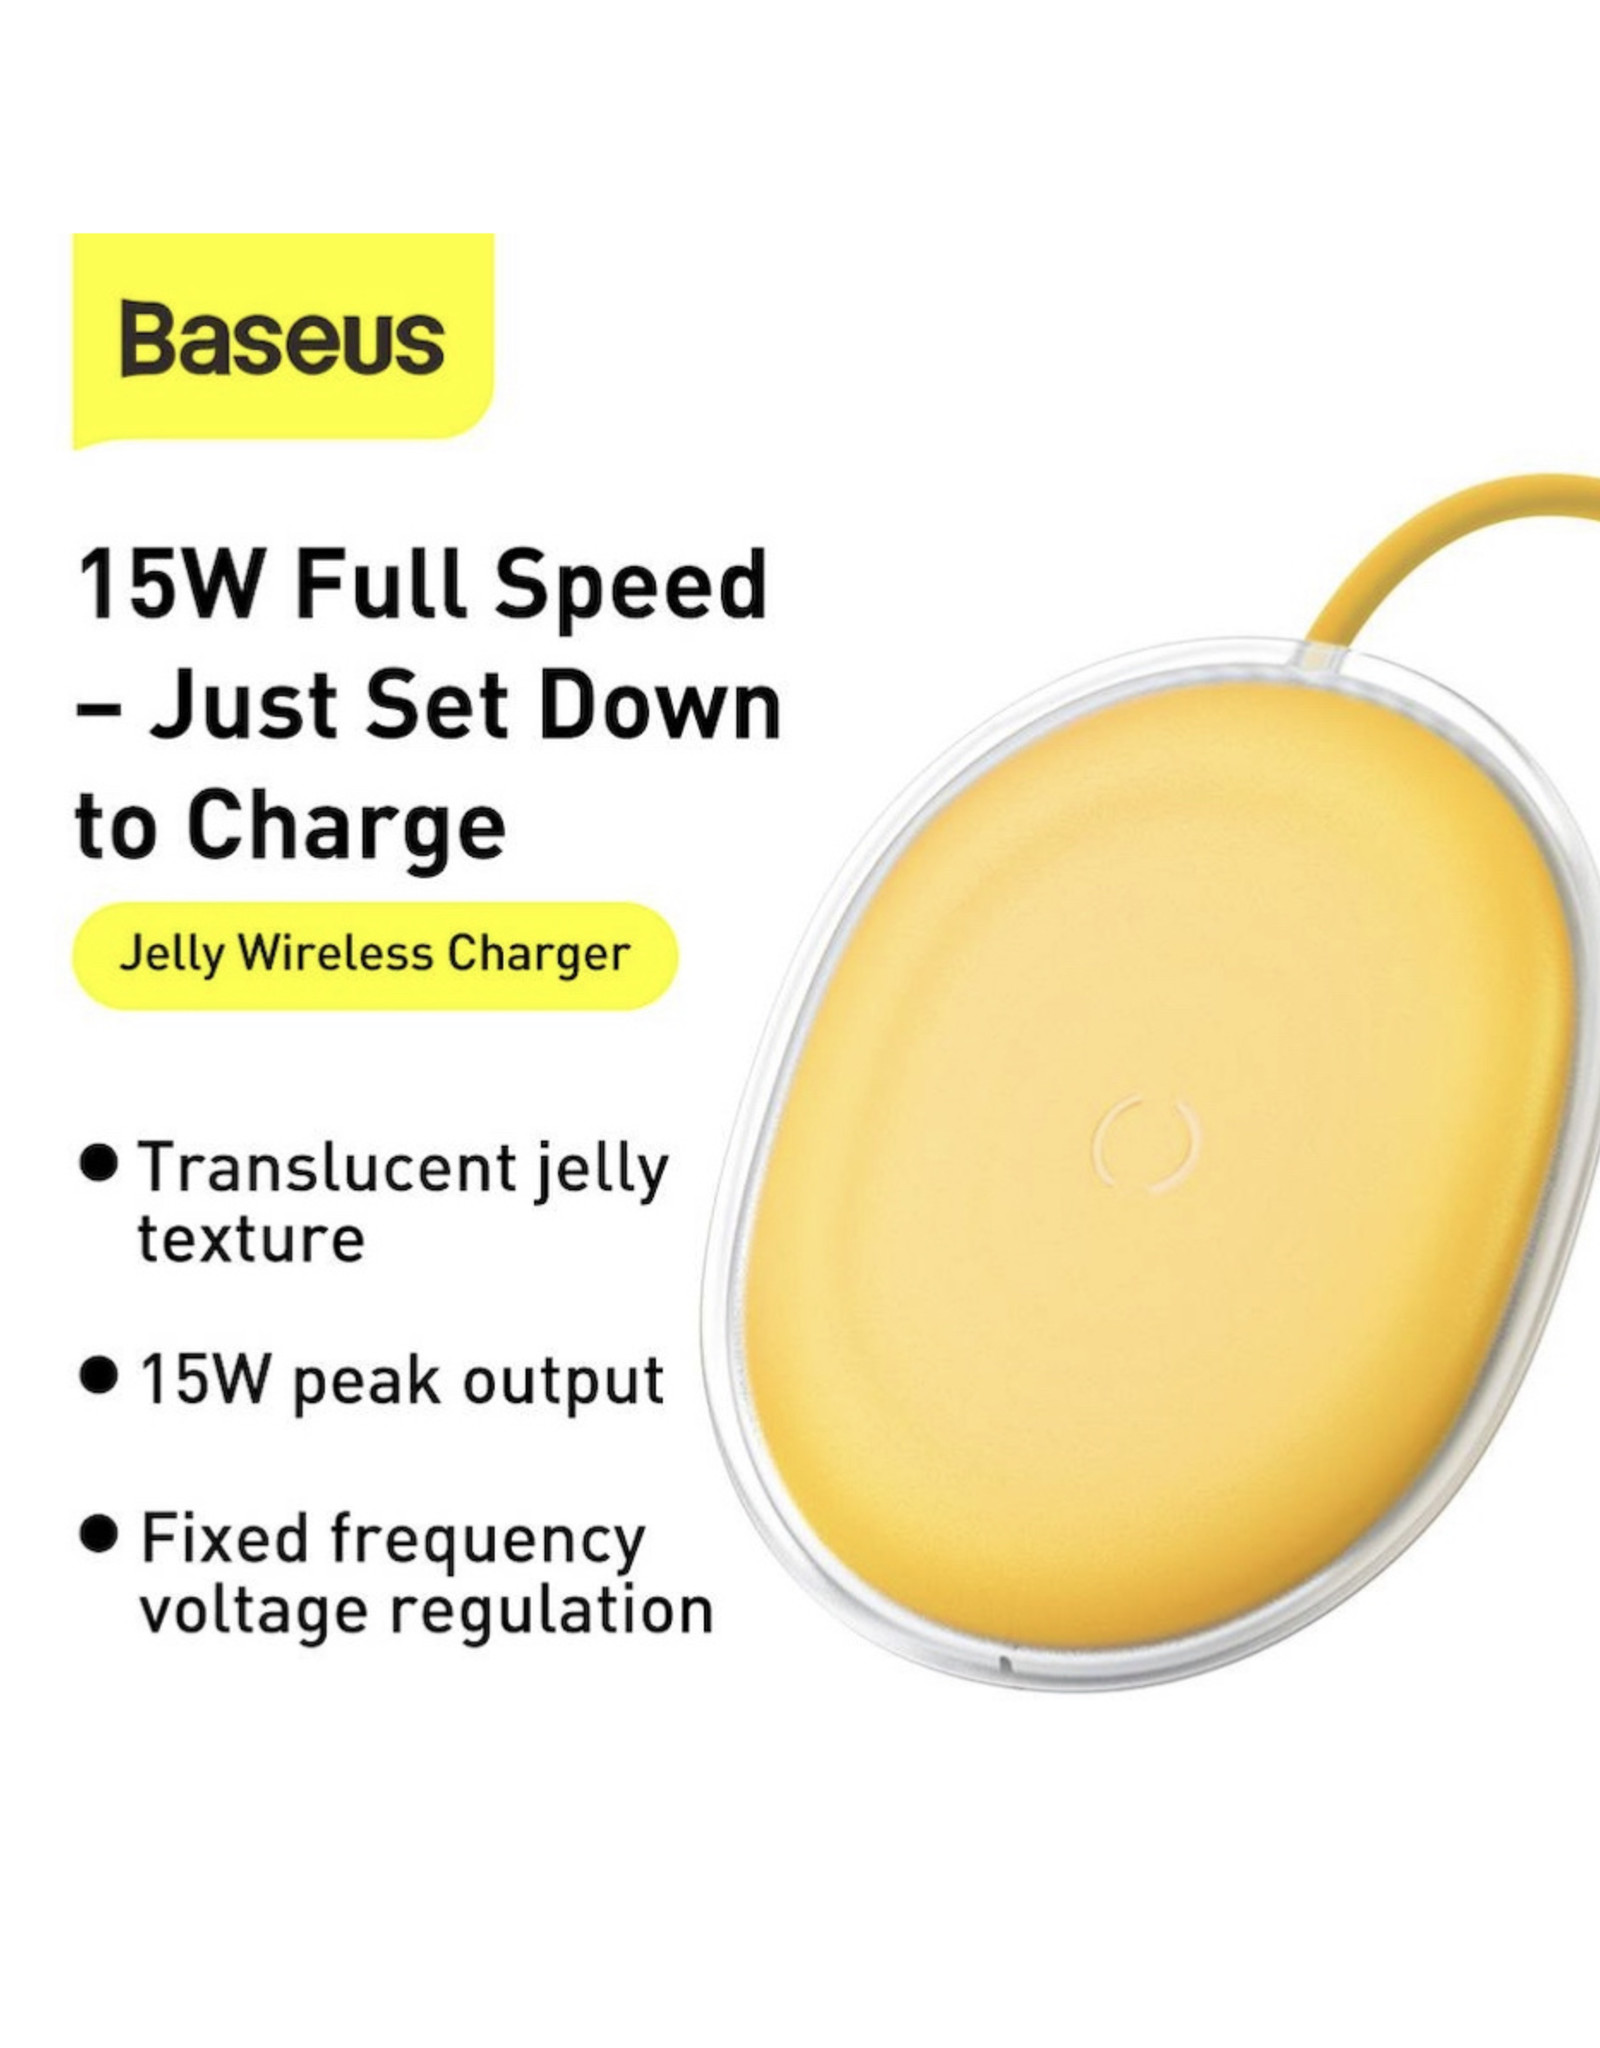 Baseus Baseus Jelly wireless charger 15W Yellow